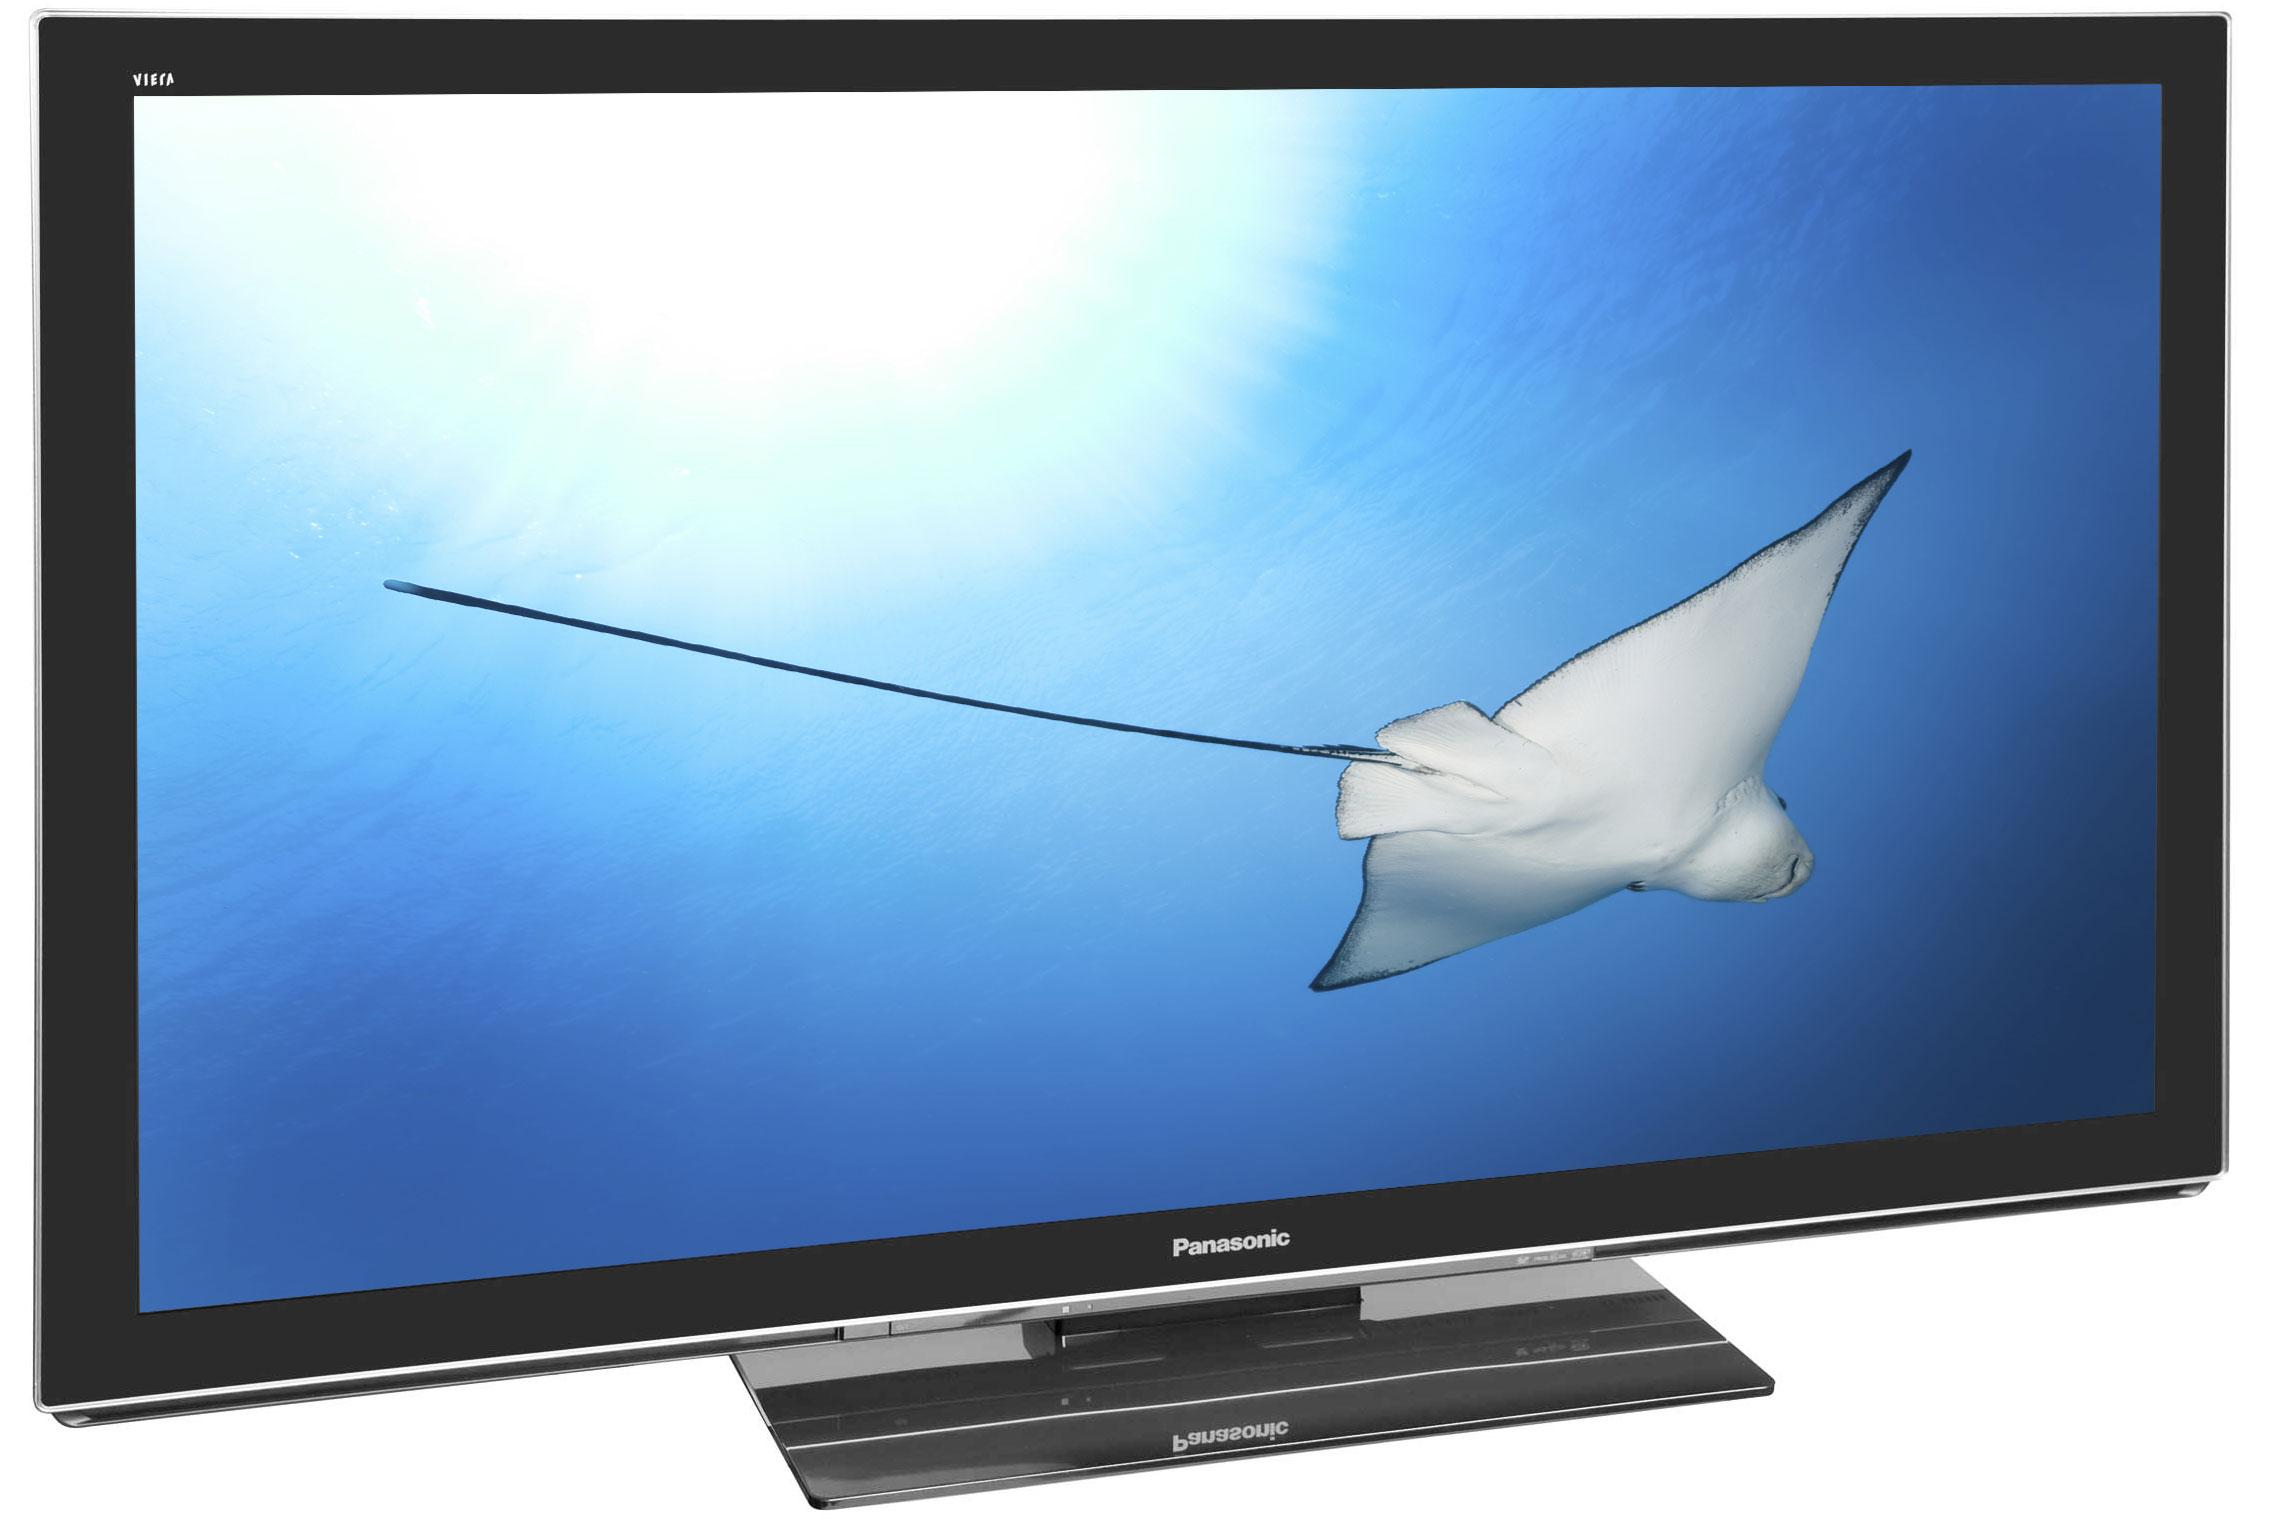 Angebot Panasonic 3d Plasma Tv 55 Zoll Neo Txp55vt30